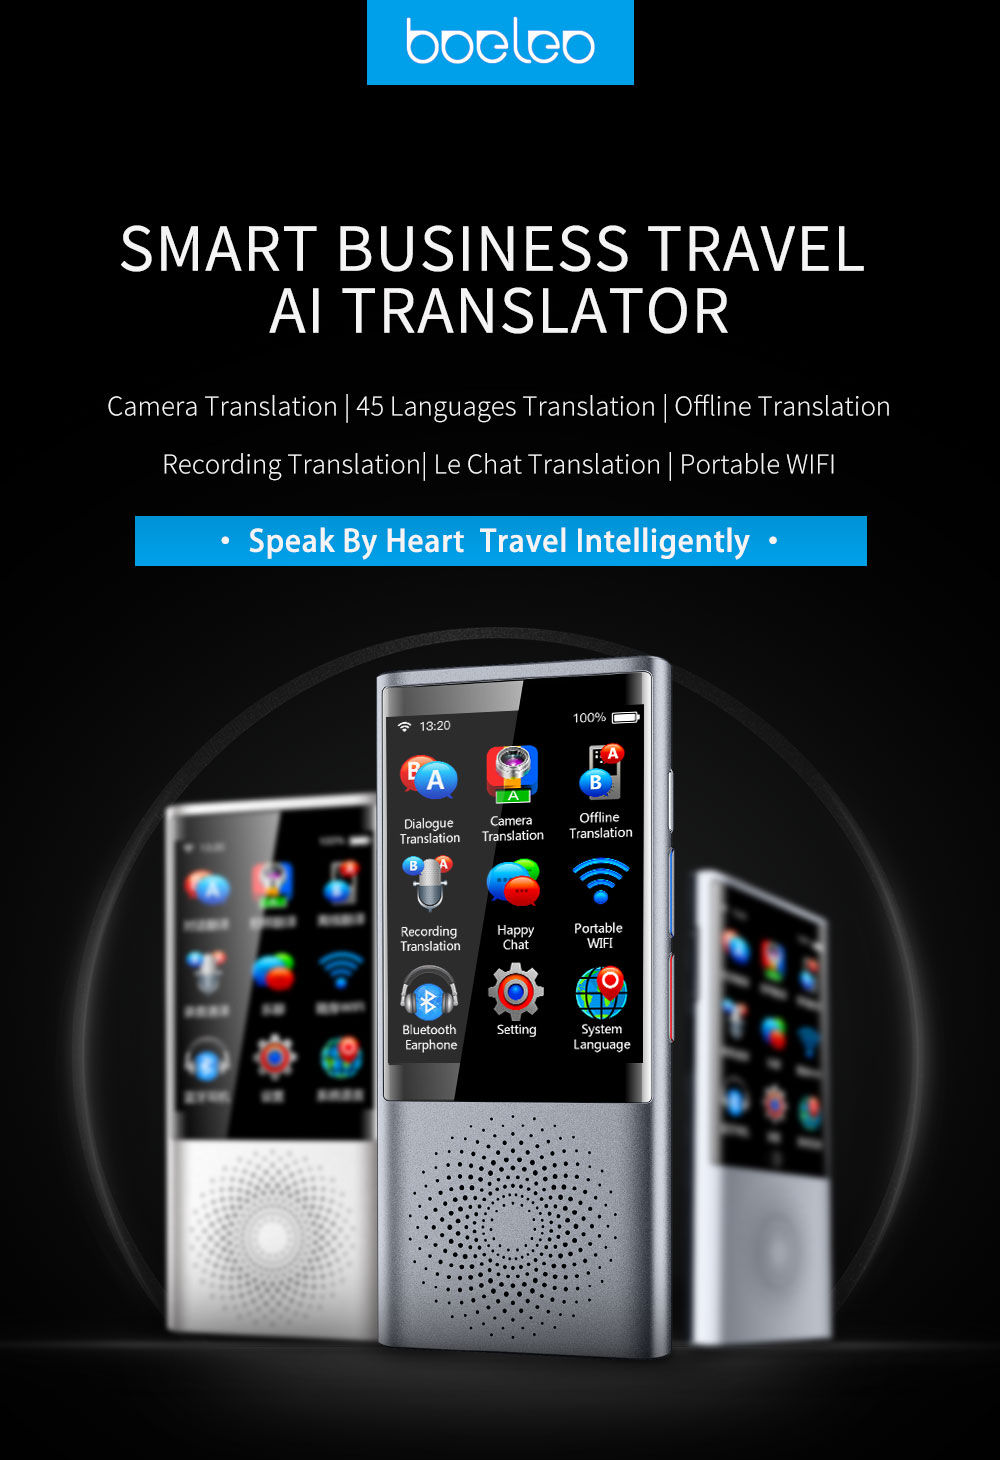 [Imagem: Boeleo-W1-AI-Touch-Control-Voice-Translator-1.jpg]